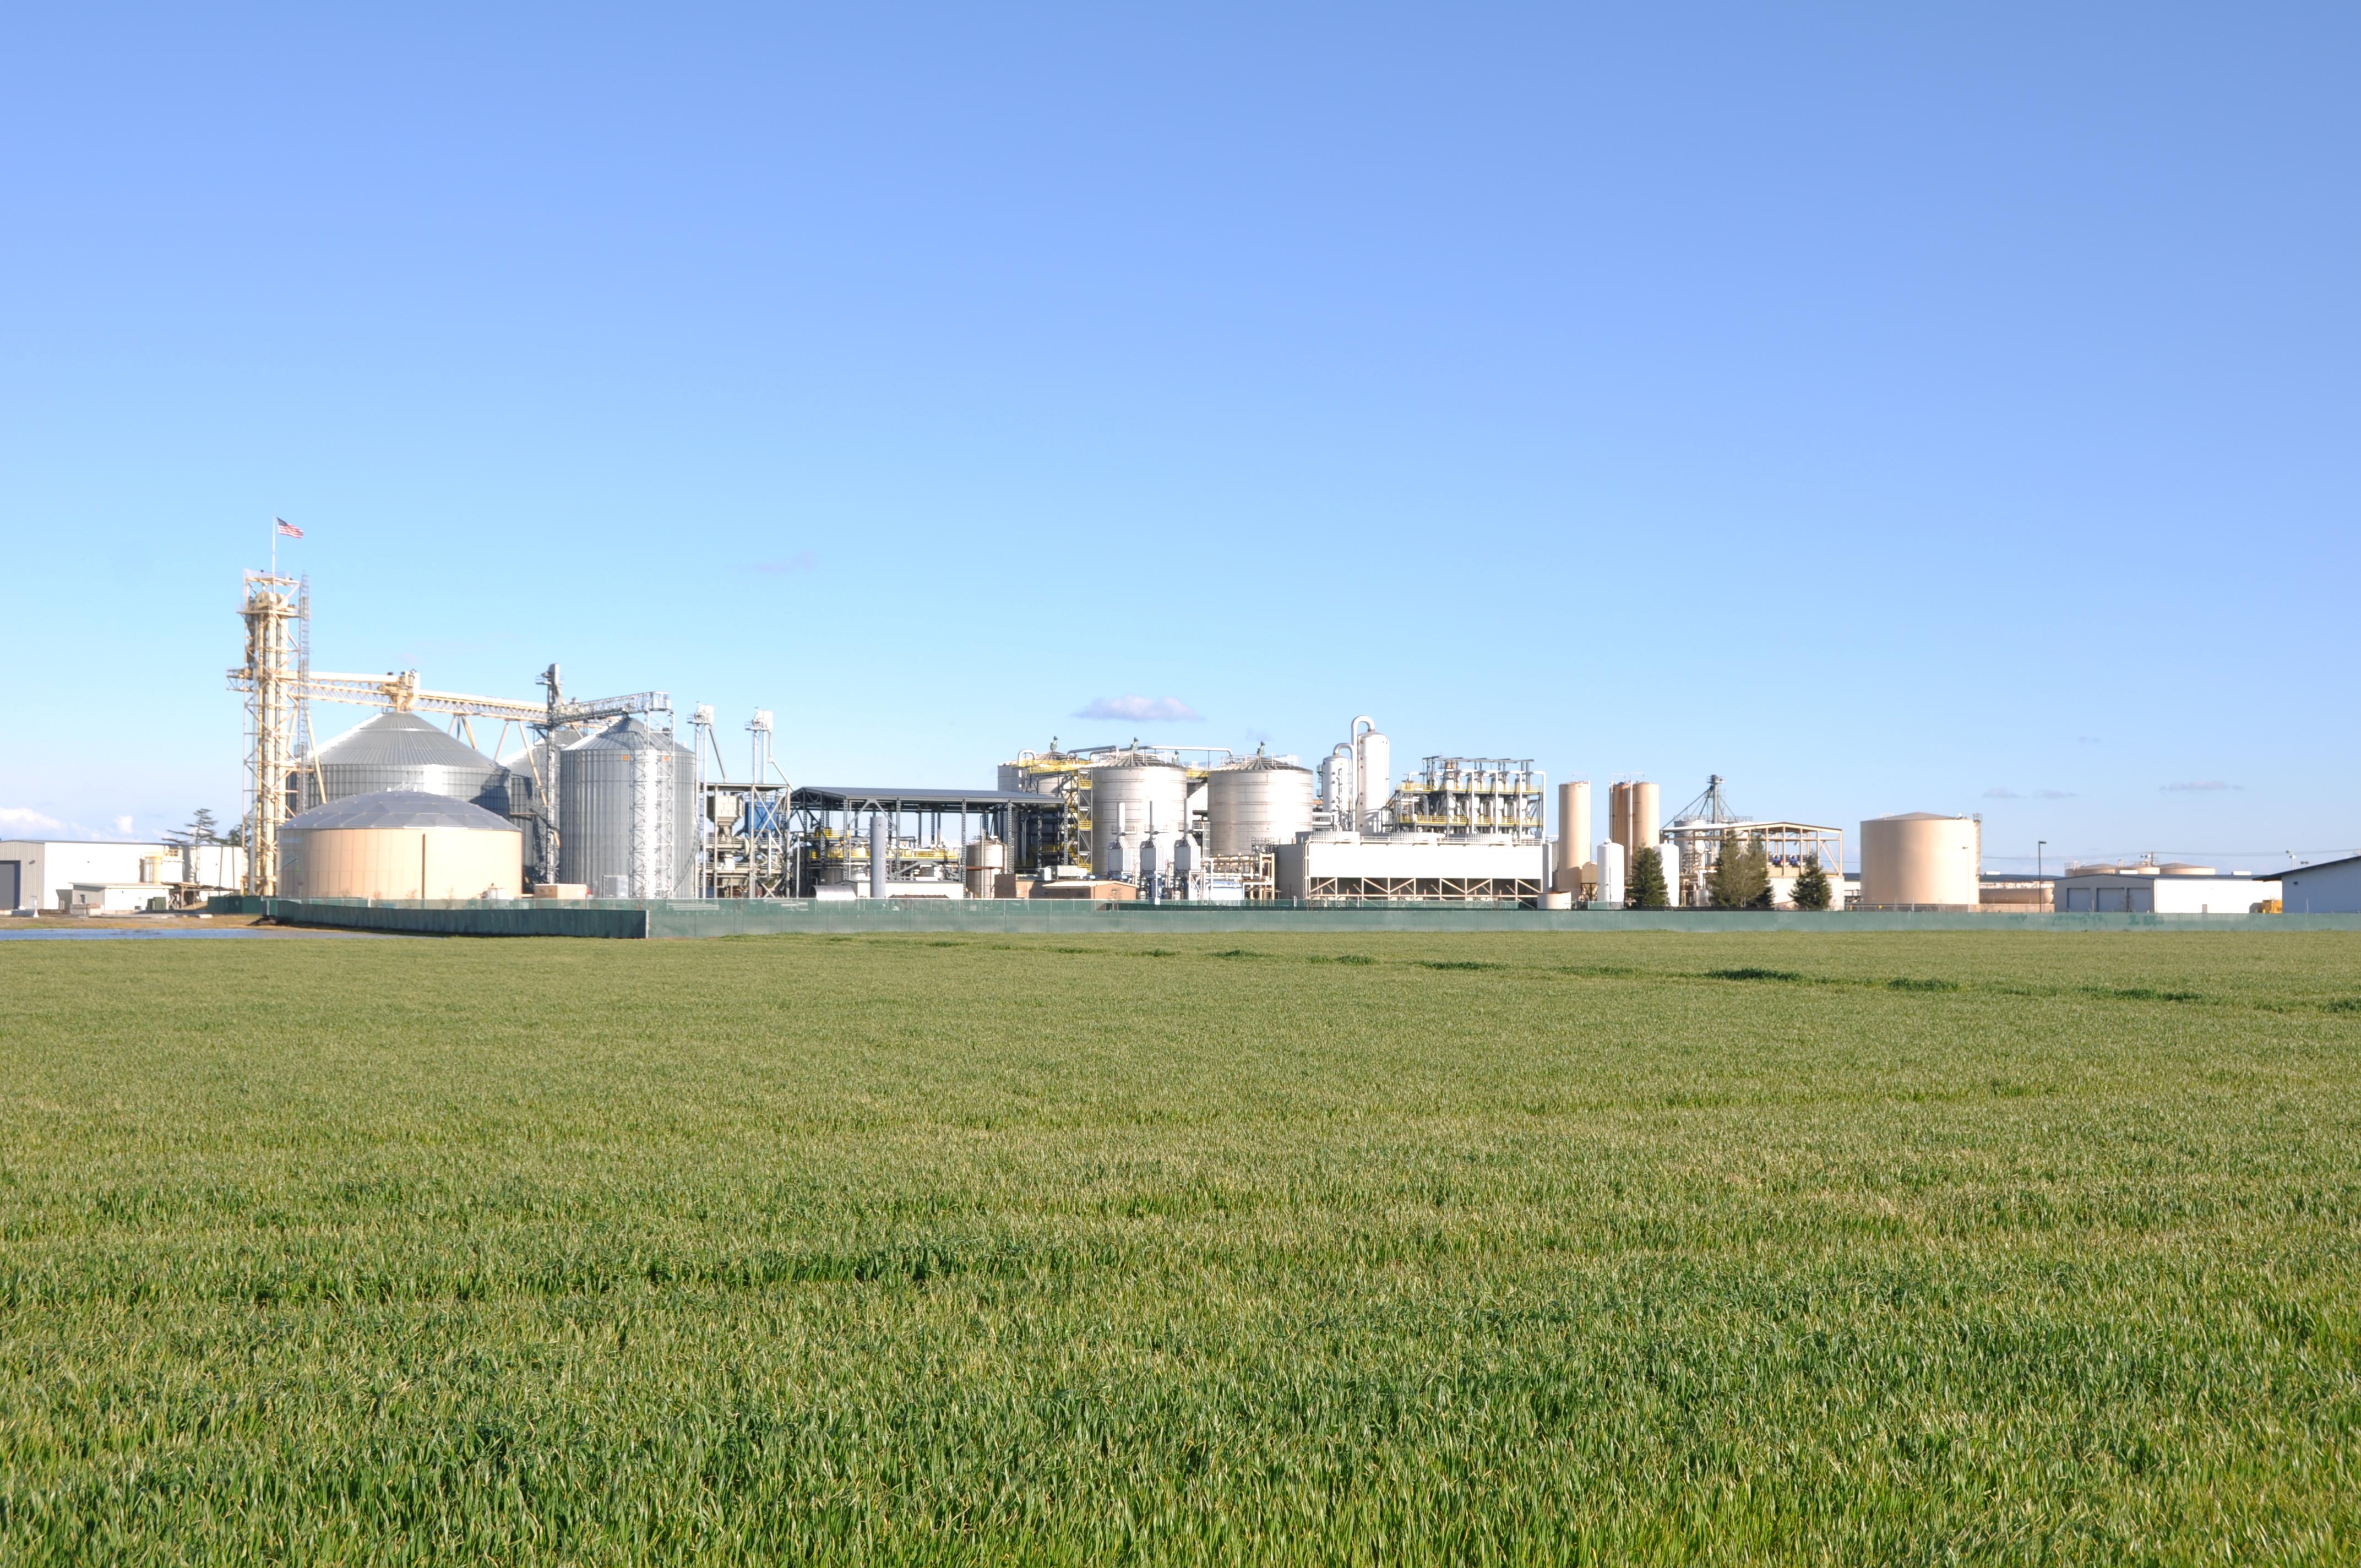 Ethanol production facility in Keyes, CA